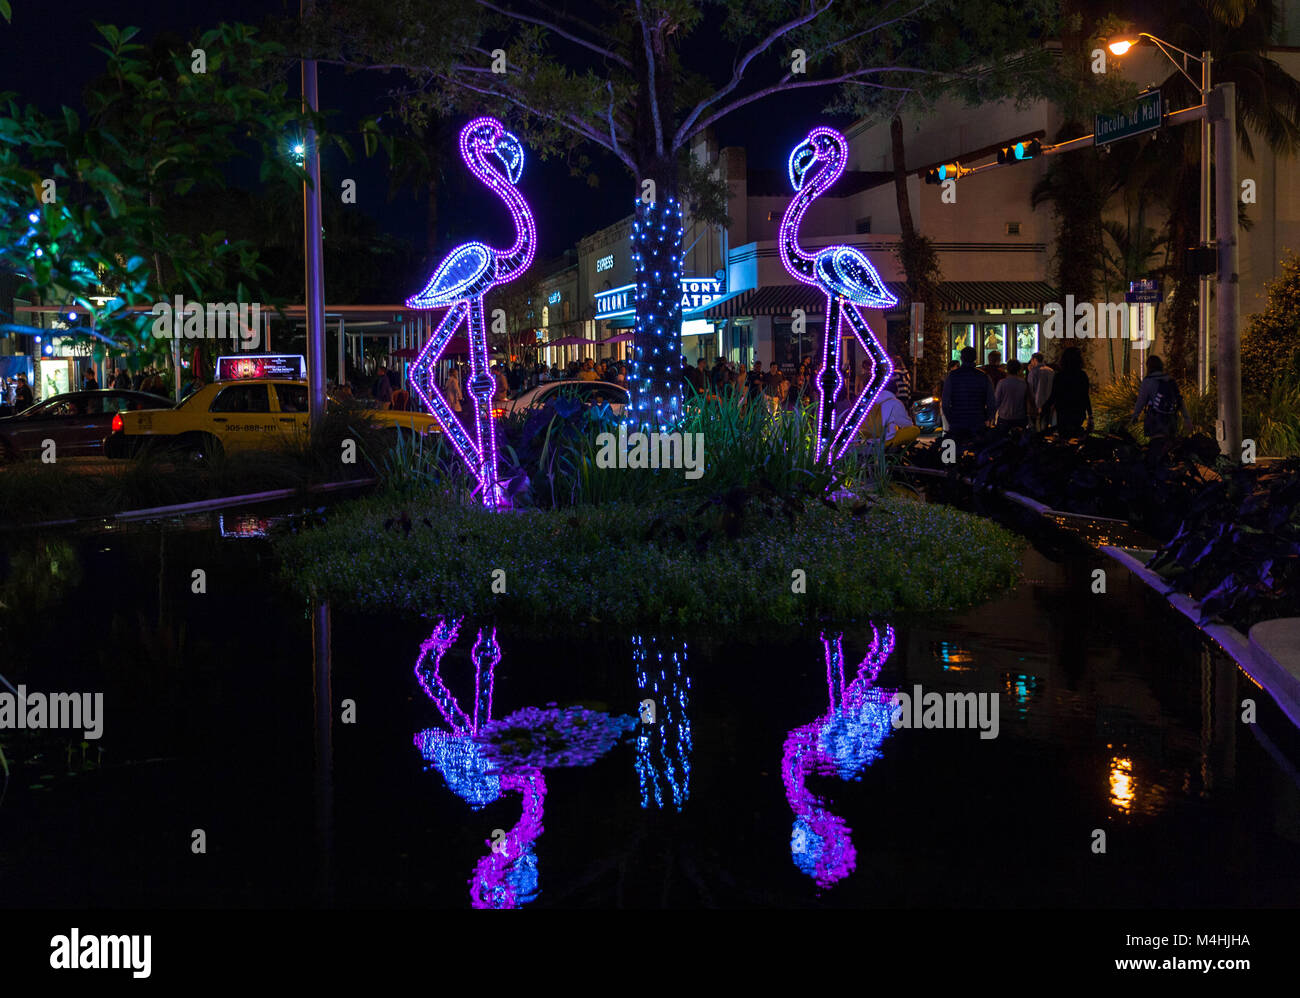 Flamingos luminosa, Lincoln Road, Miami Beach, Florida, EE.UU. Imagen De Stock